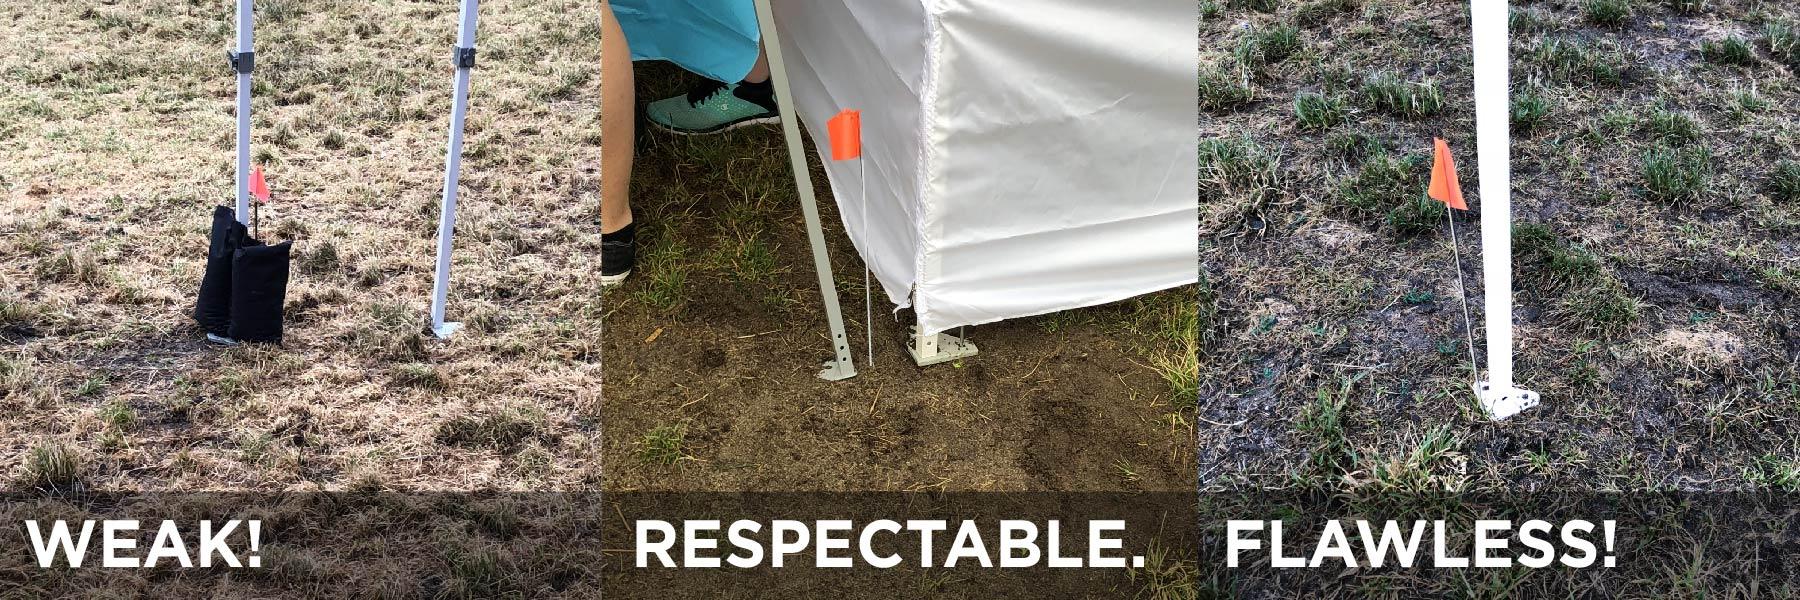 tents-flags-01.jpg